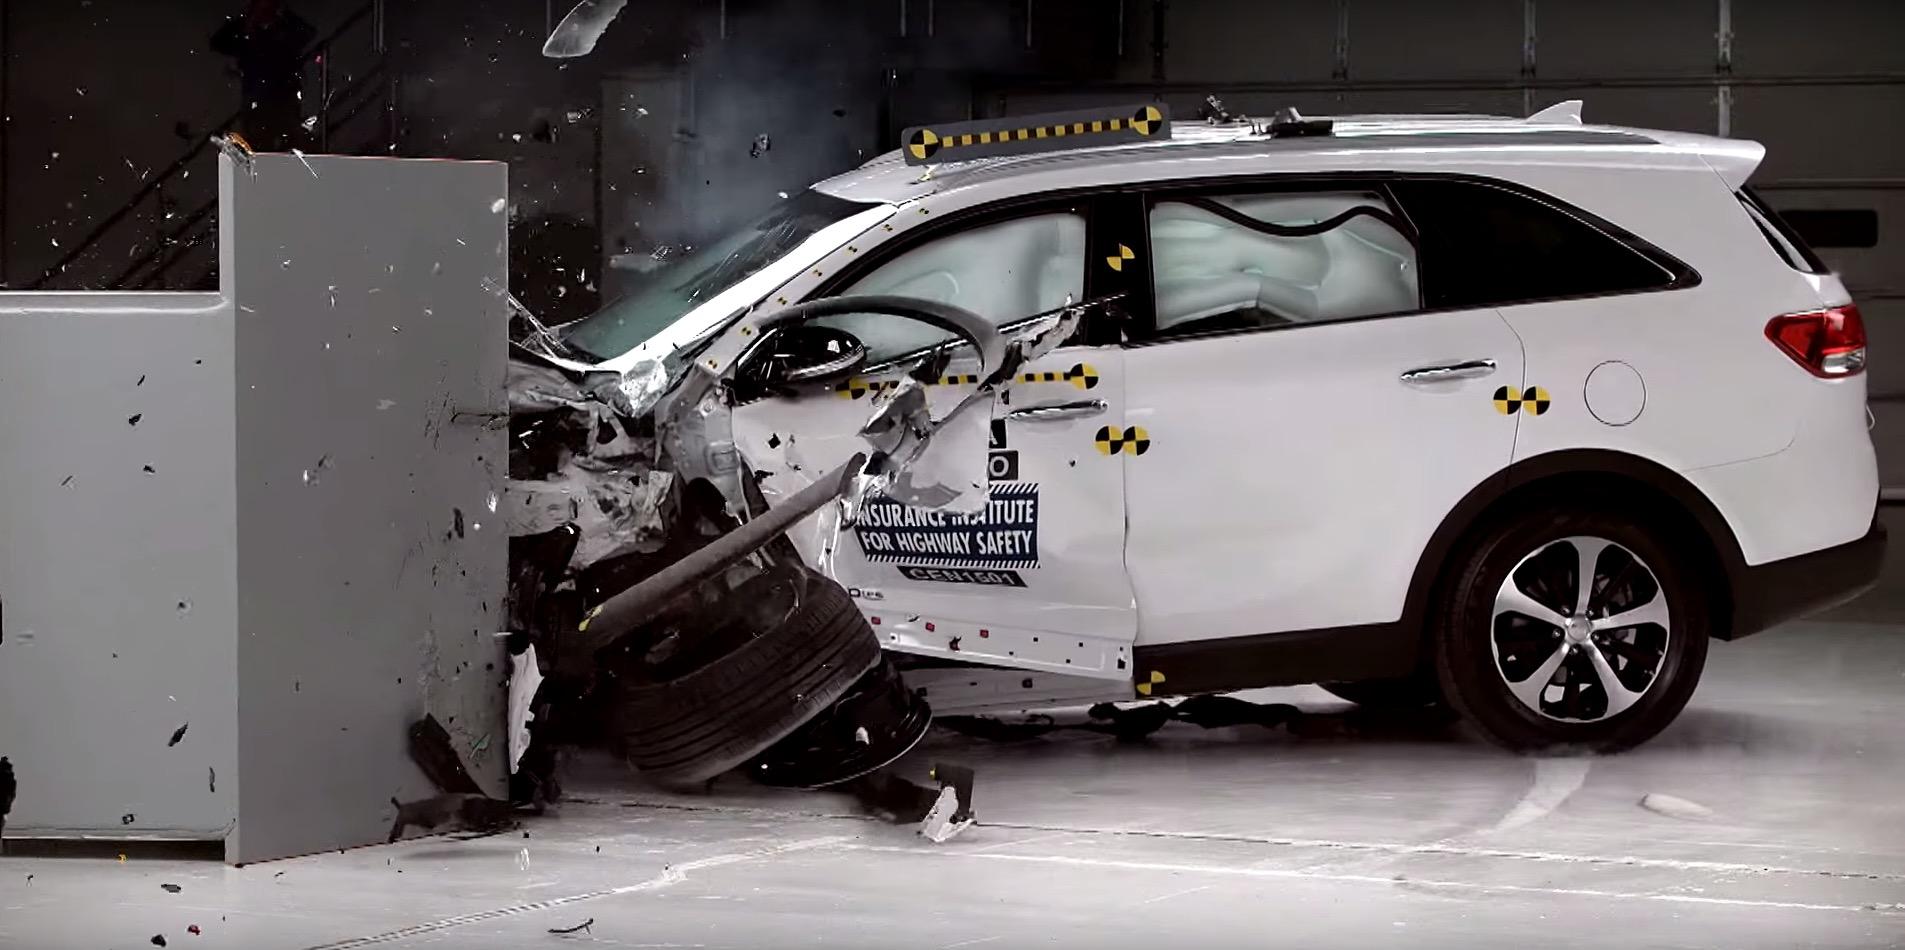 2017 kia sorento crashes its way to earn top safety pick rating autoevolution